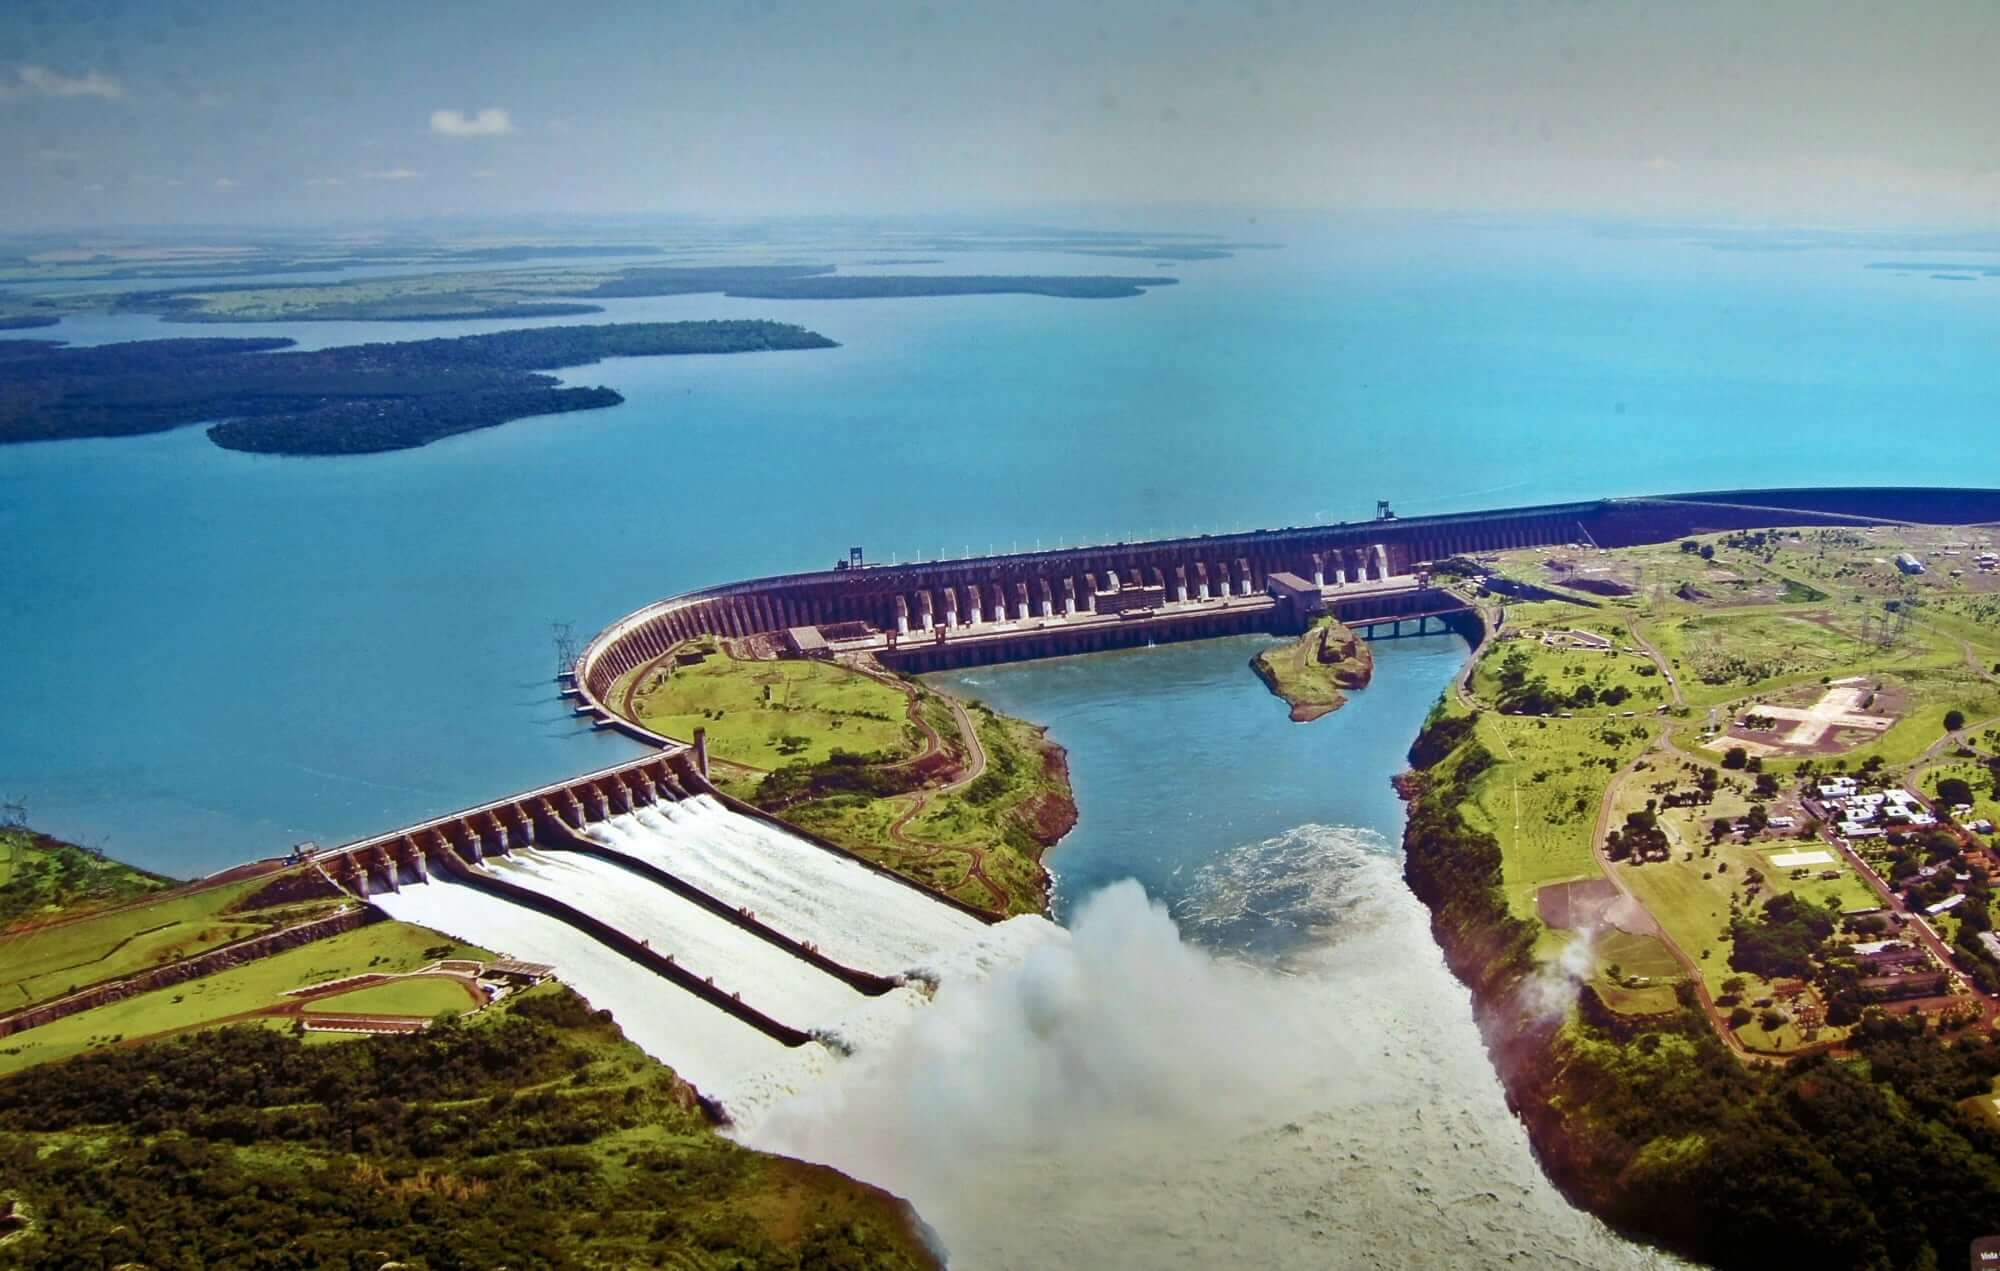 Itaipu Dam between Brazil and Paraguay